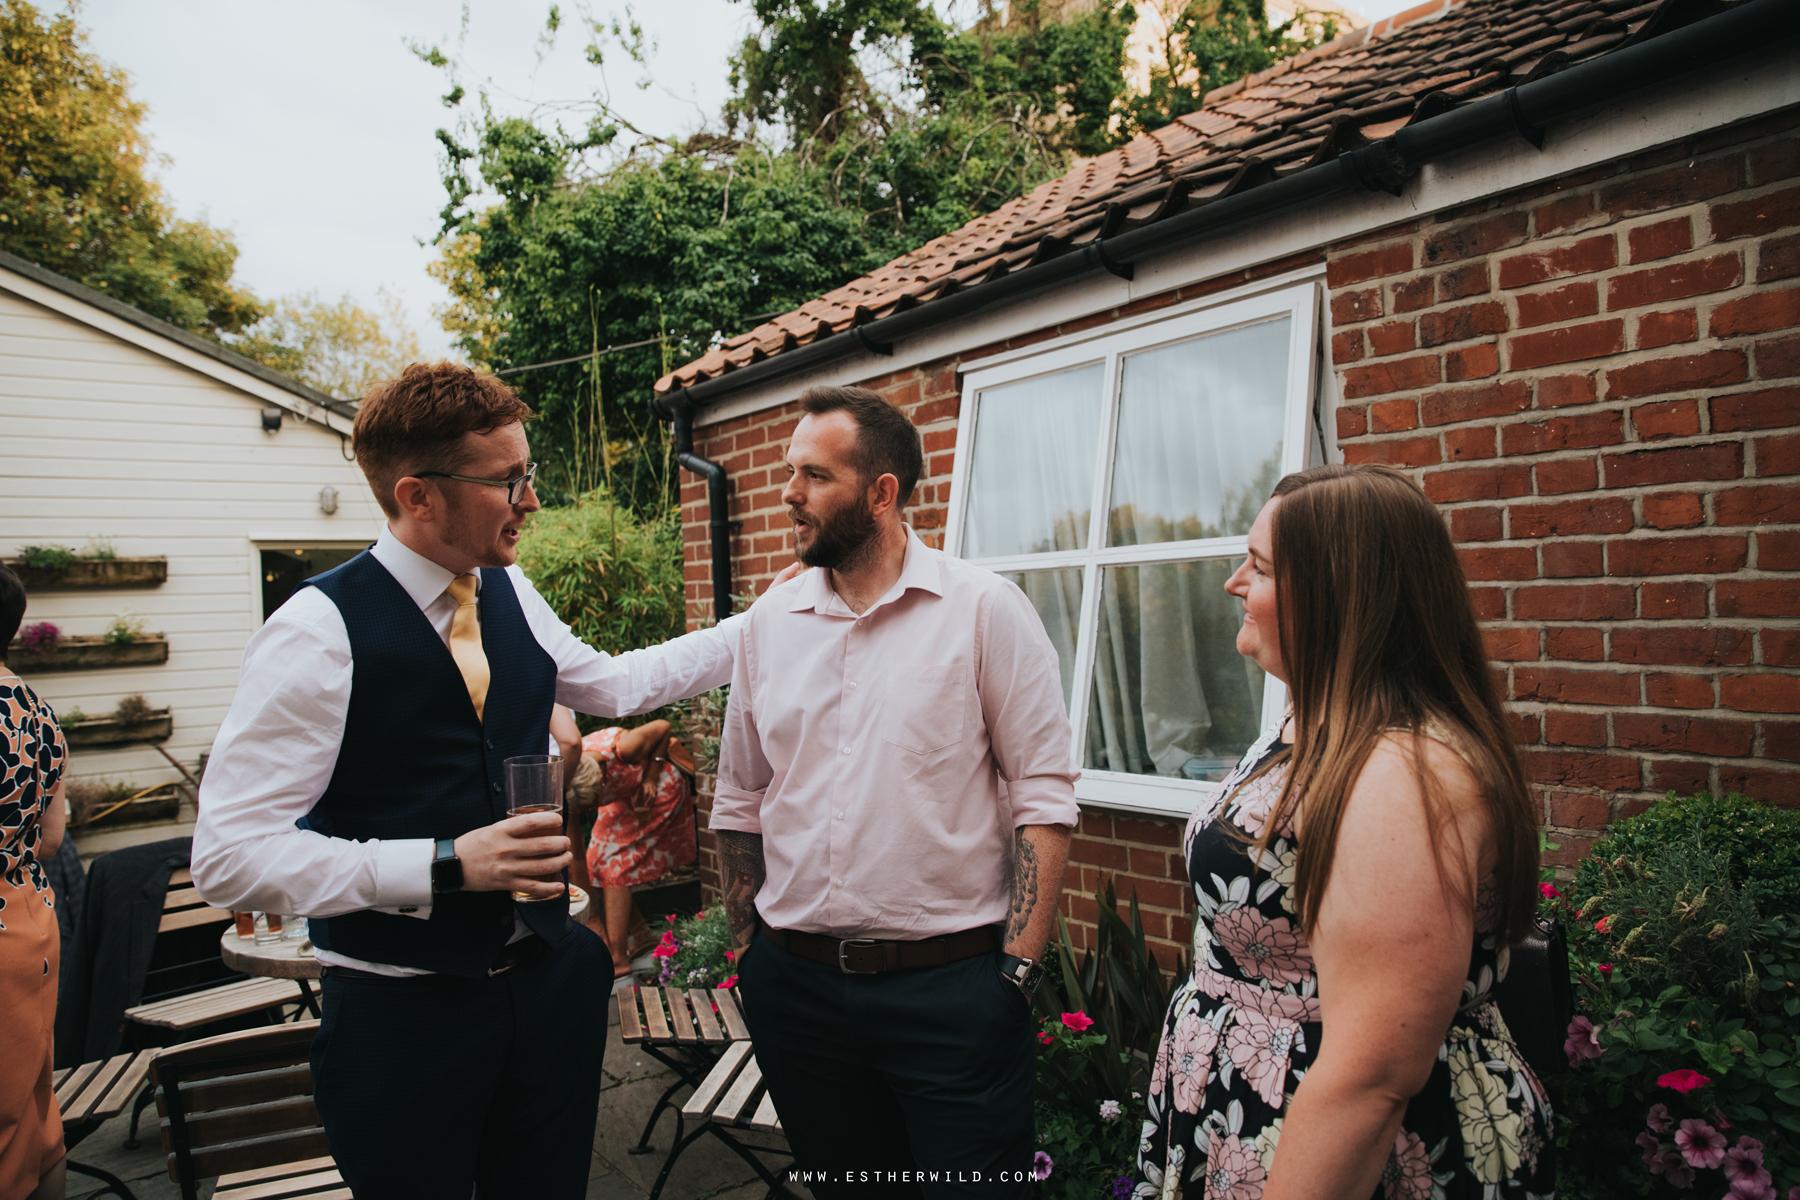 The_Georgian_Townhouse_Wedding_Norwich_Esther_Wild_Photographer_3R8A2845.jpg